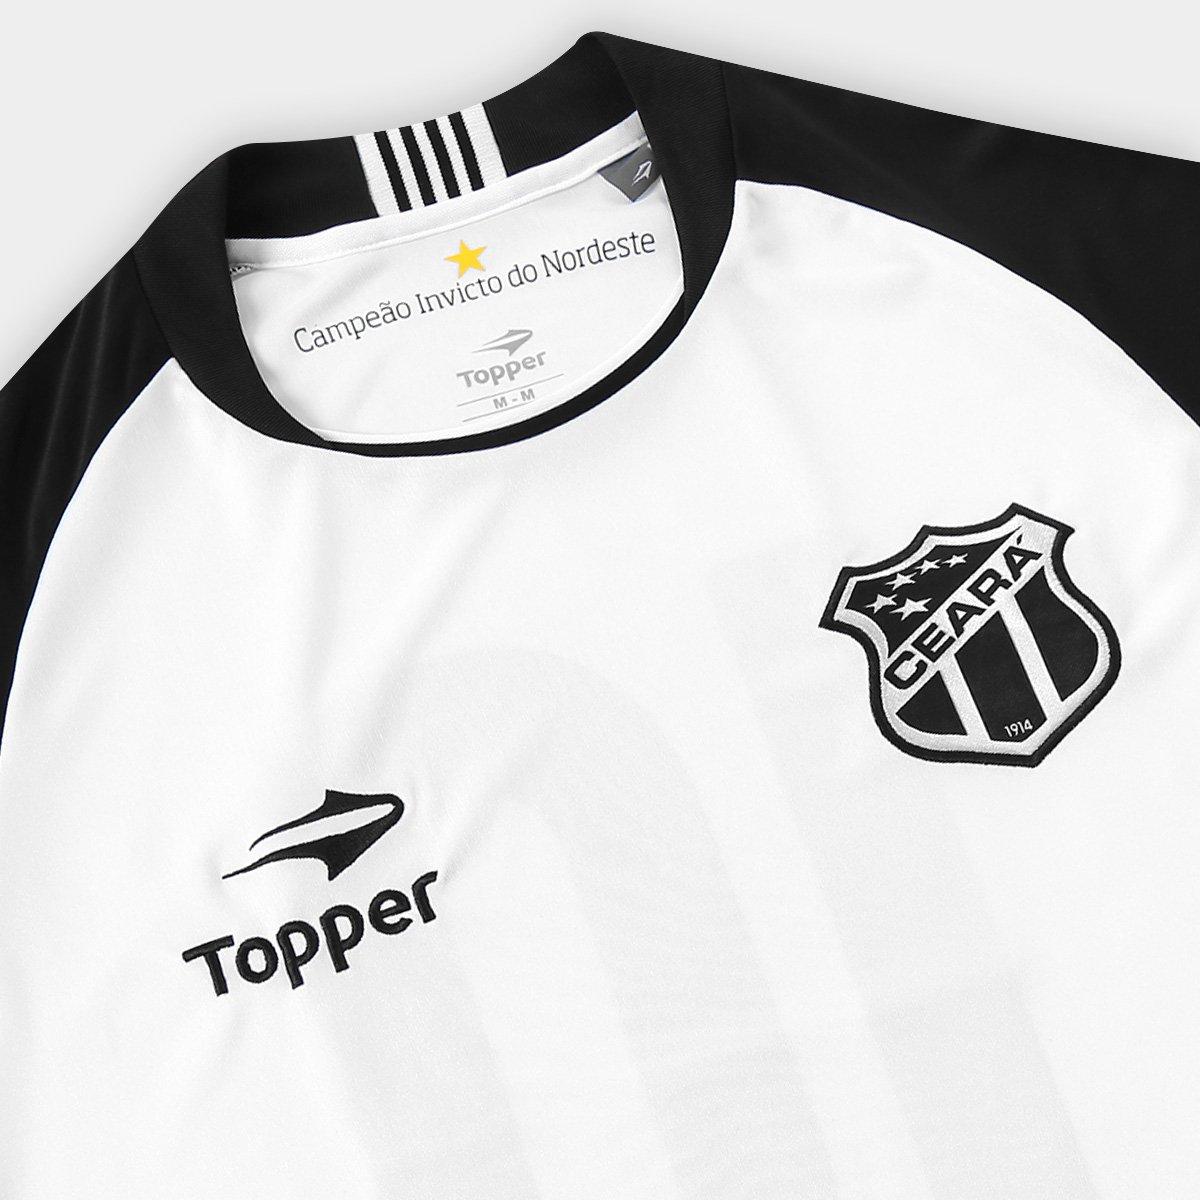 Camisa Ceará II 2016 nº 10 Torcedor Topper Masculina - Compre Agora ... 832d3ae9312b3